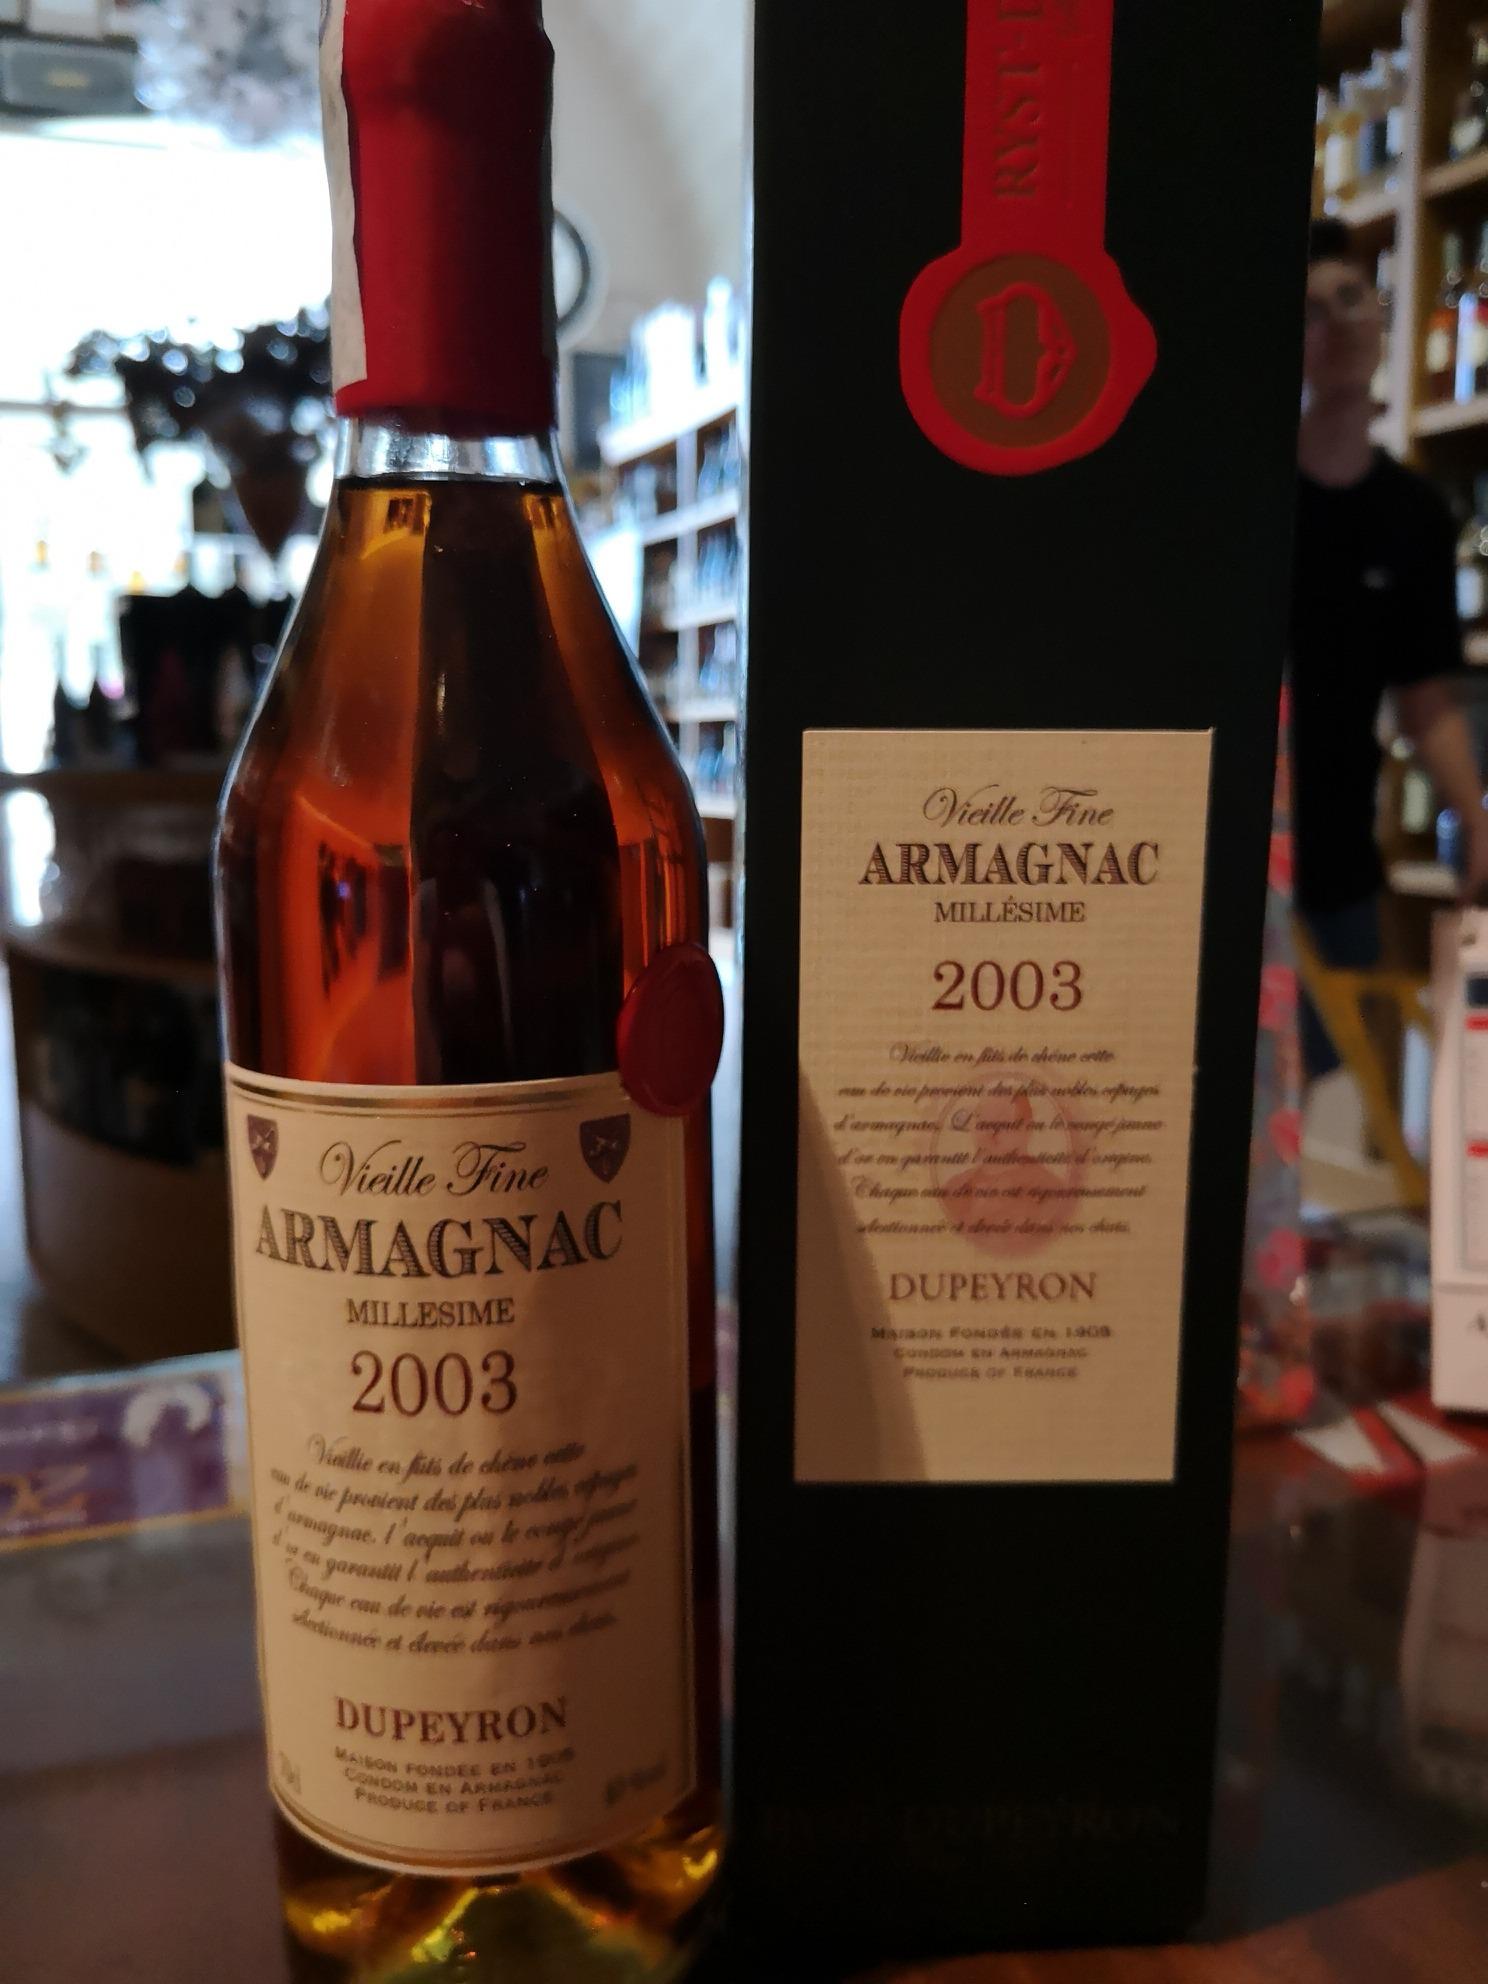 Armagnac Dupeyron 2003